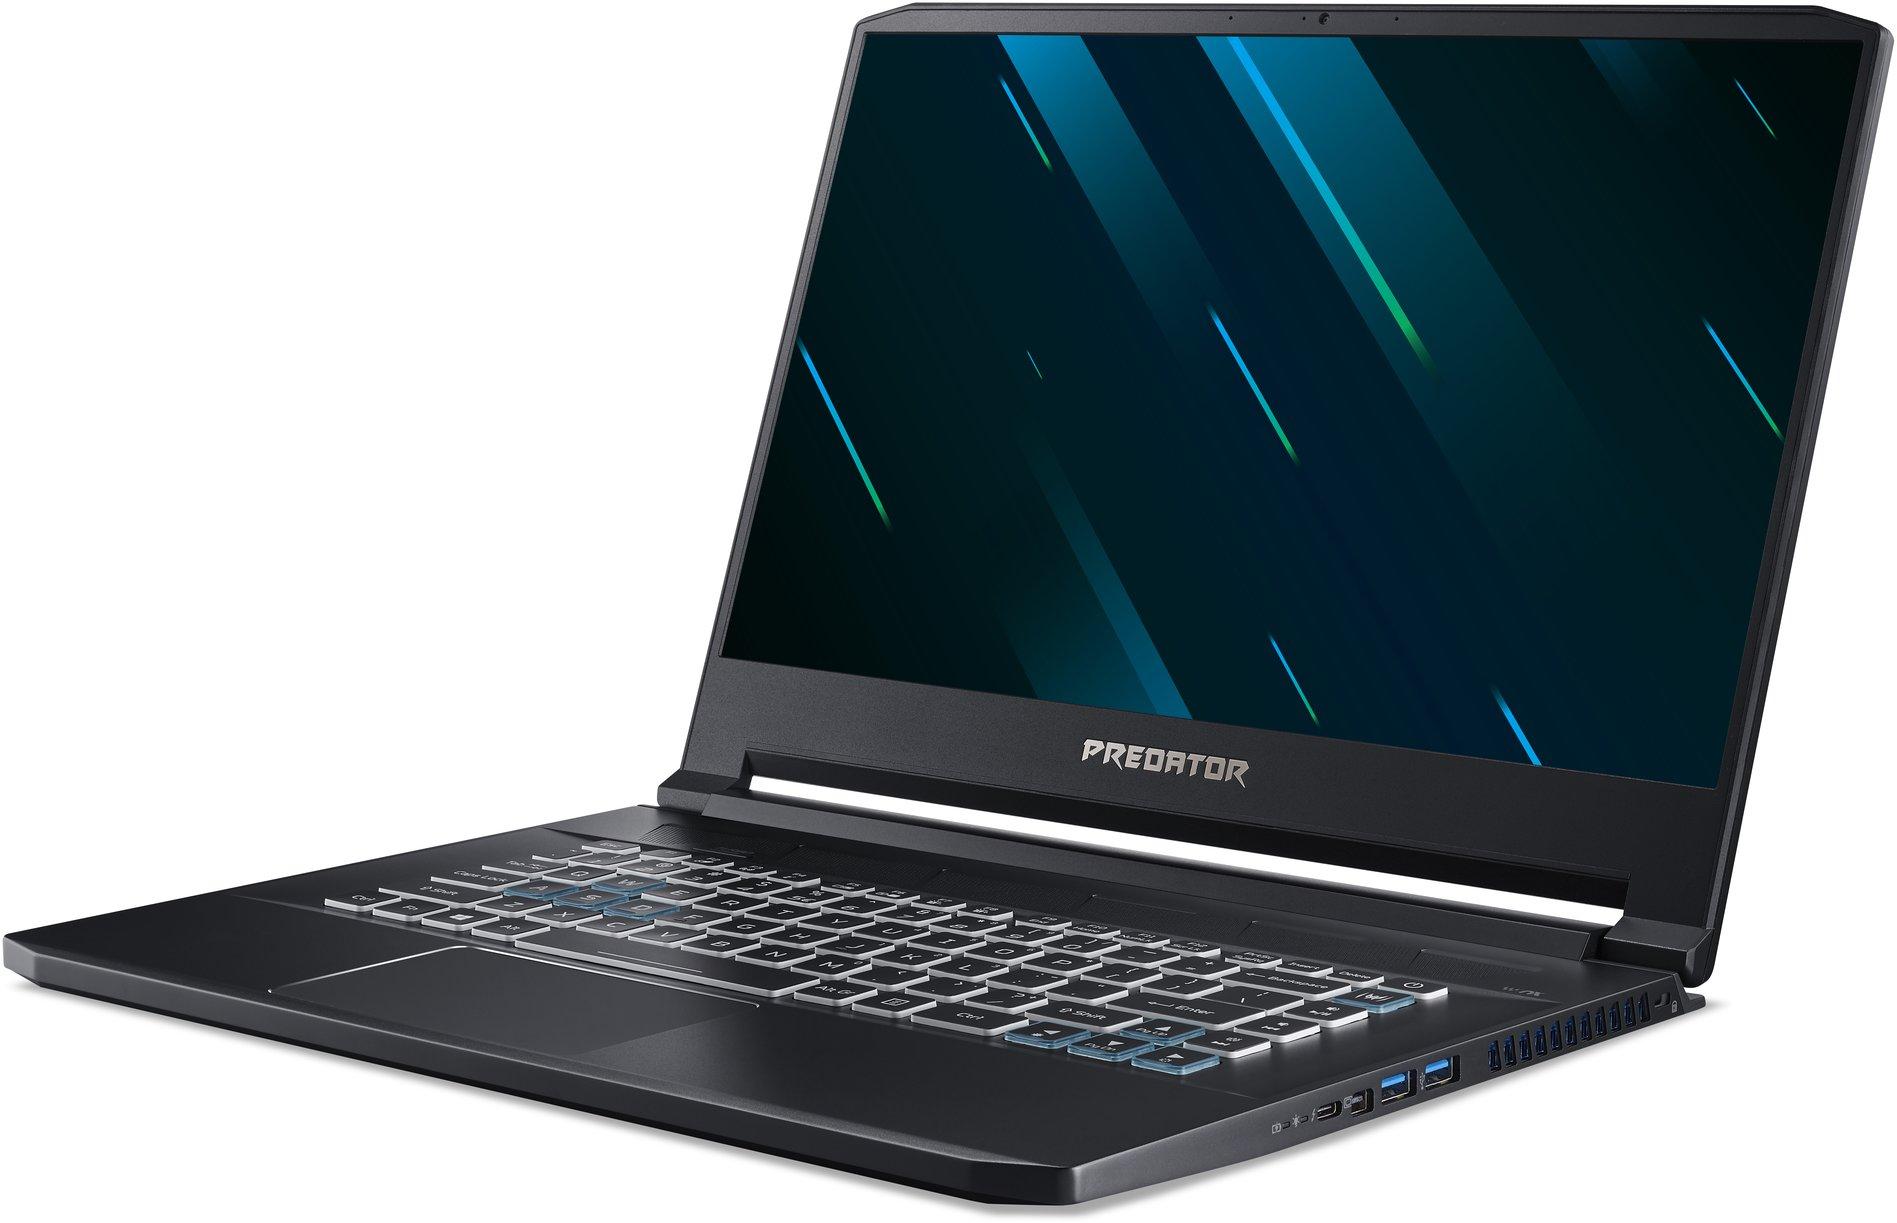 Acer Predator Triton 500 PT515-51-704N